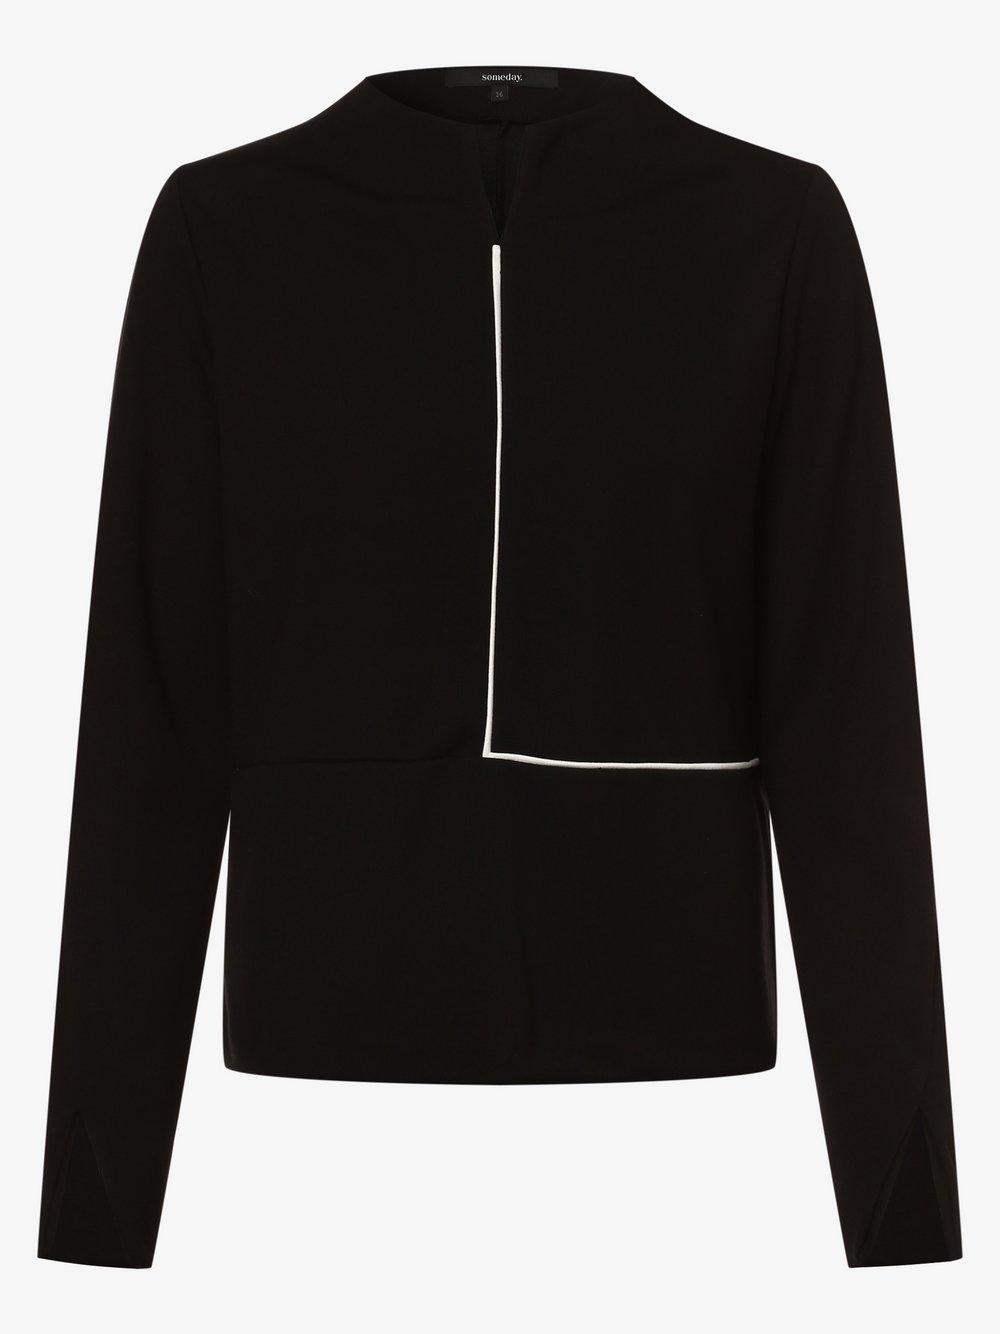 Someday - Damska bluza nierozpinana – Ufuk Tipping, czarny